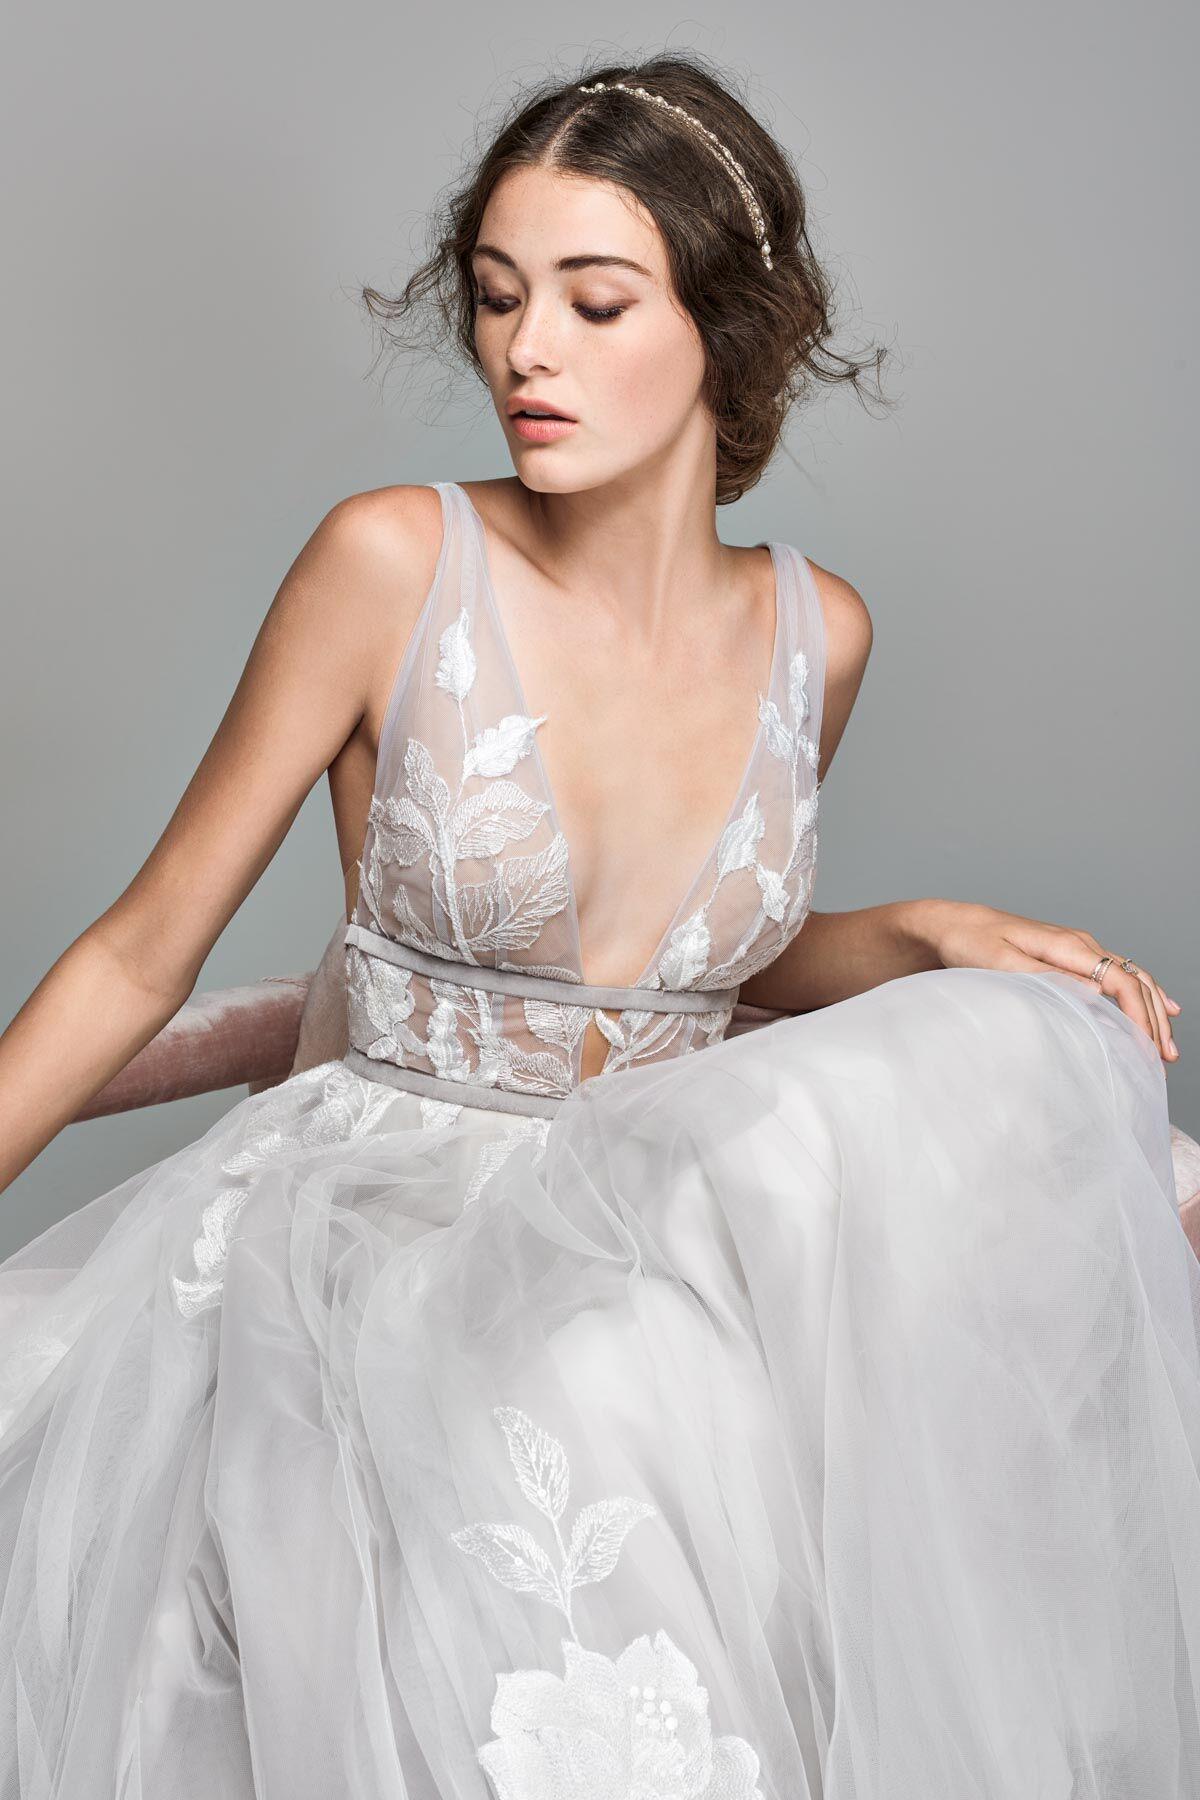 de26ca5c757 Prom Dress Shops Near Canton Ohio - Gomes Weine AG